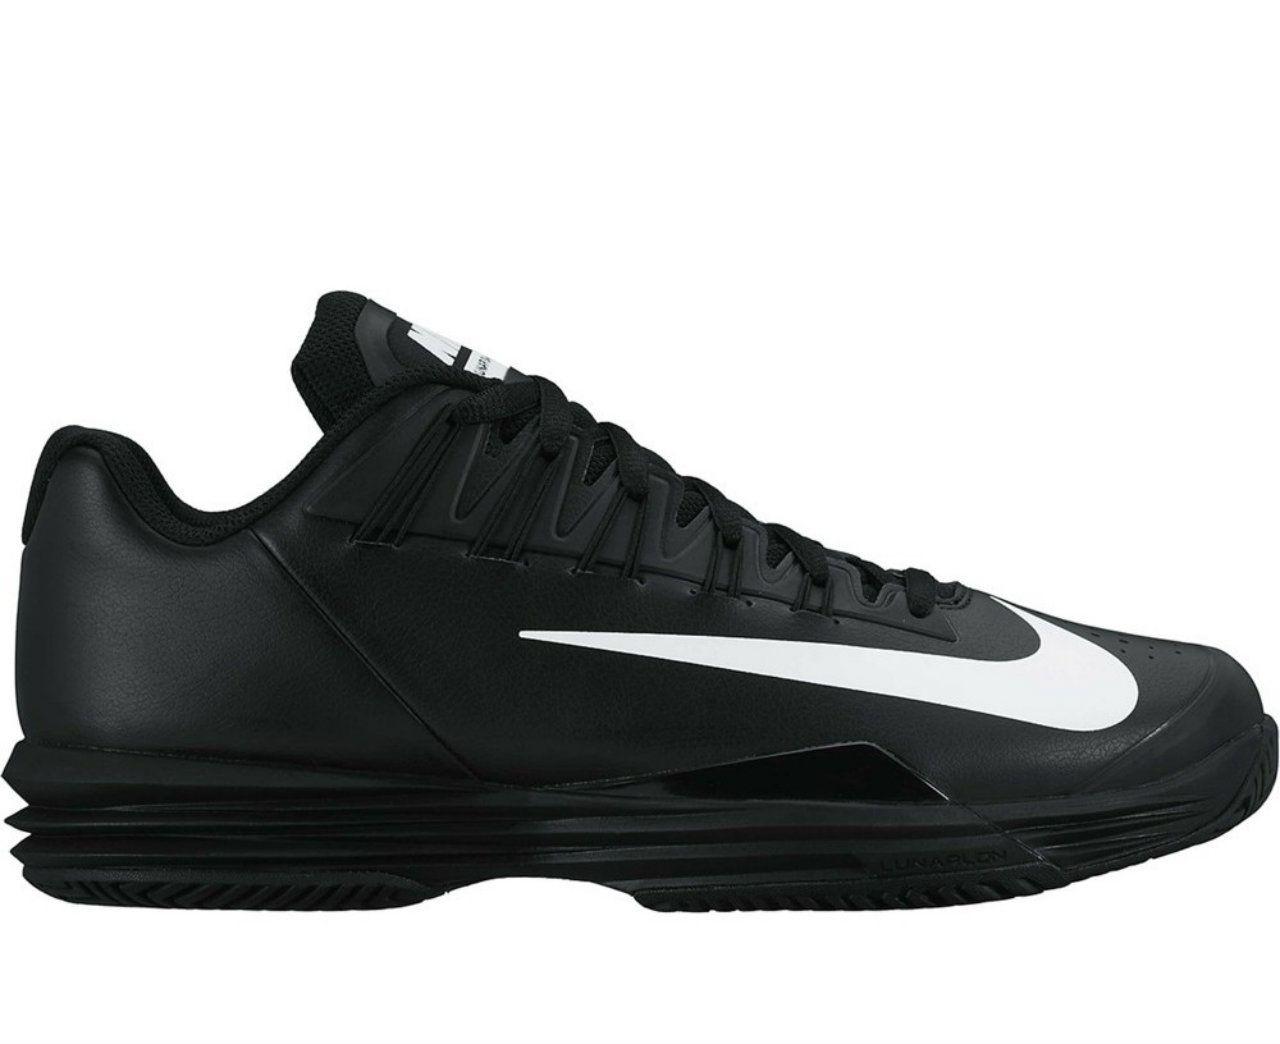 Sleek Men's Nike Black Training Shoes